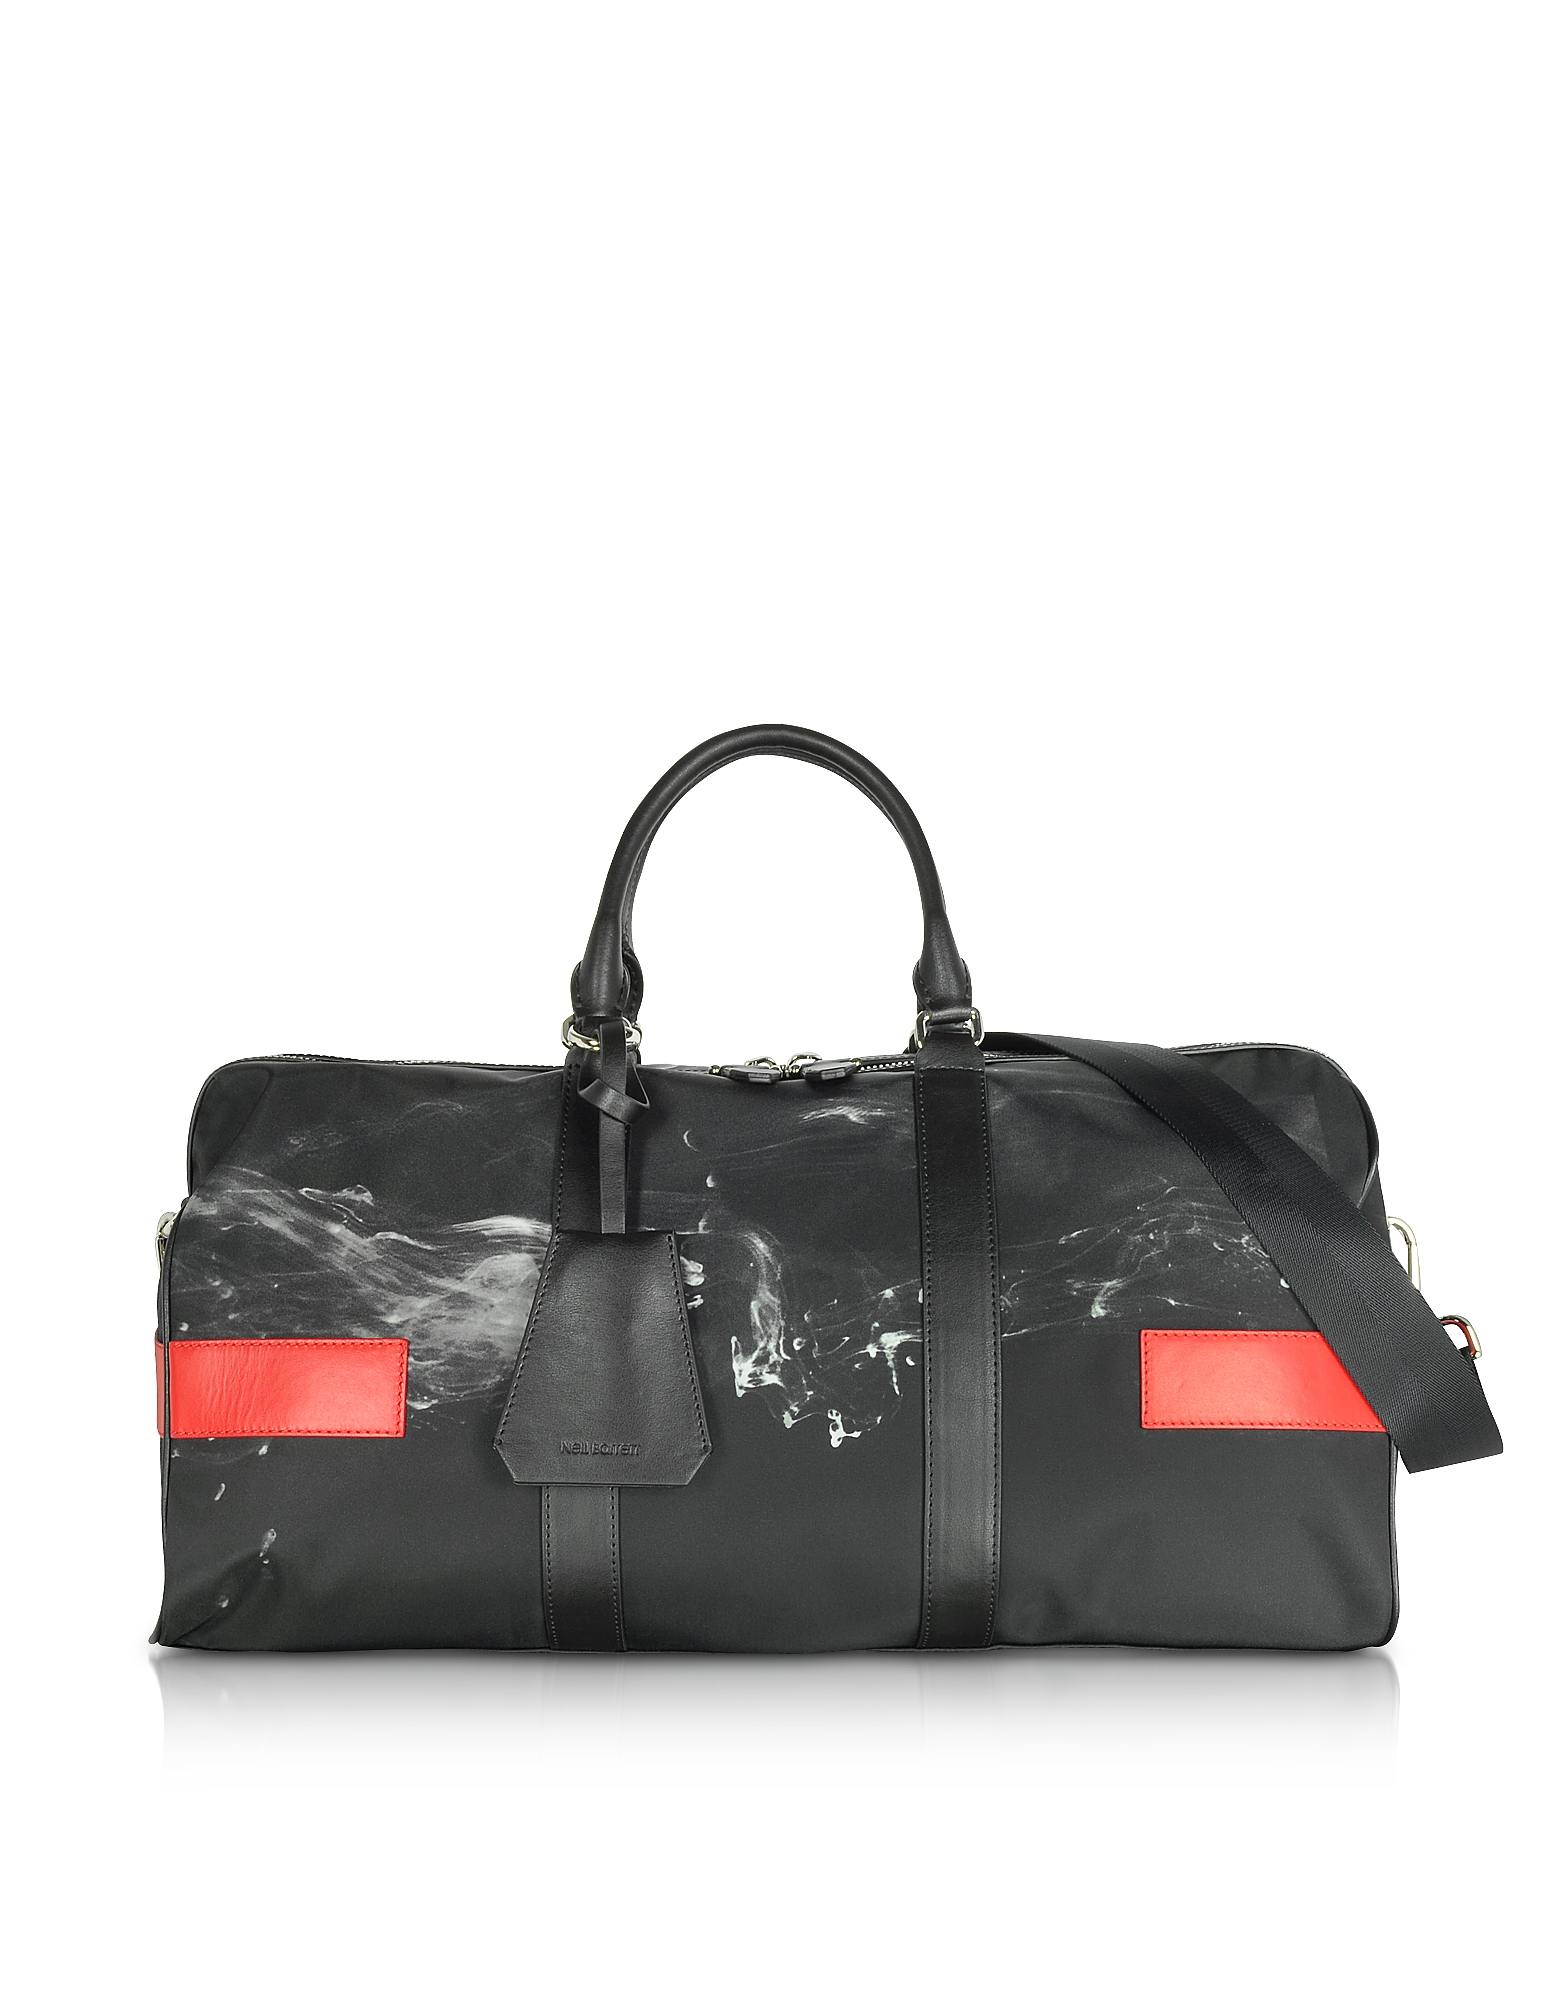 Neil Barrett Travel Bags, Black/White Liquid Ink Printed Nylon Gym Bag w/Red Leather Band